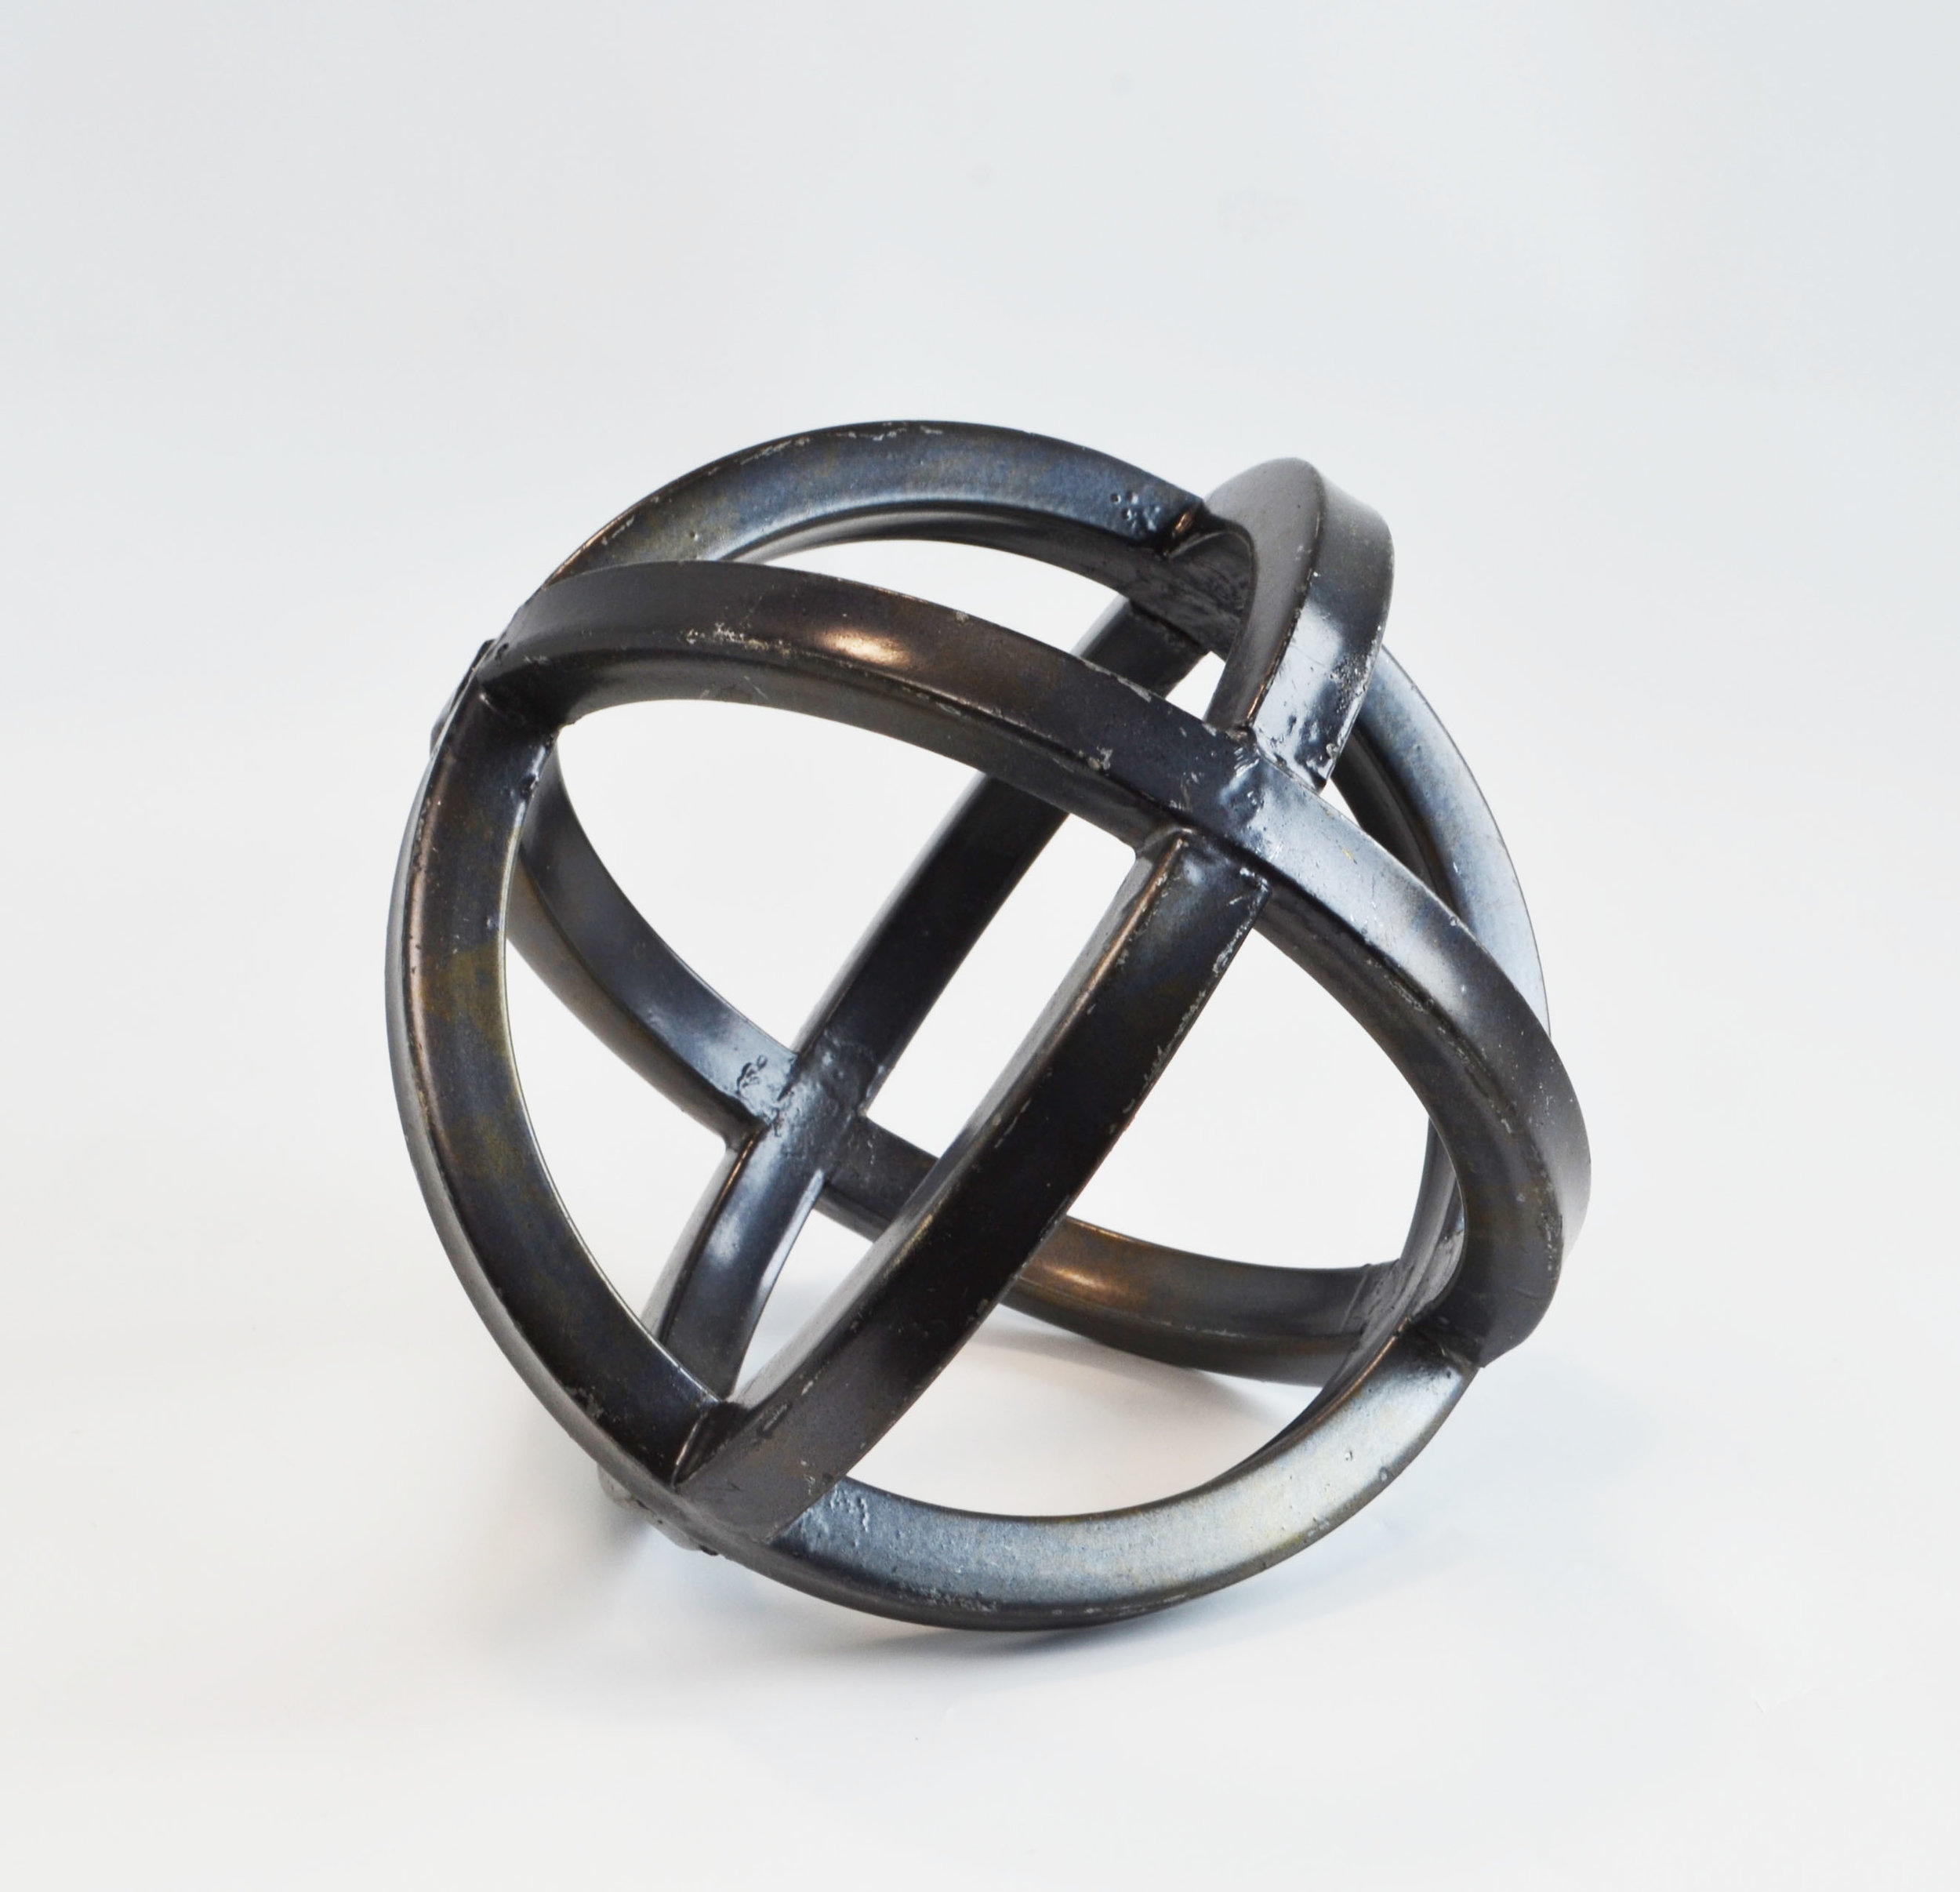 industrial black sphere   Quantity: 3  Price: $7.50